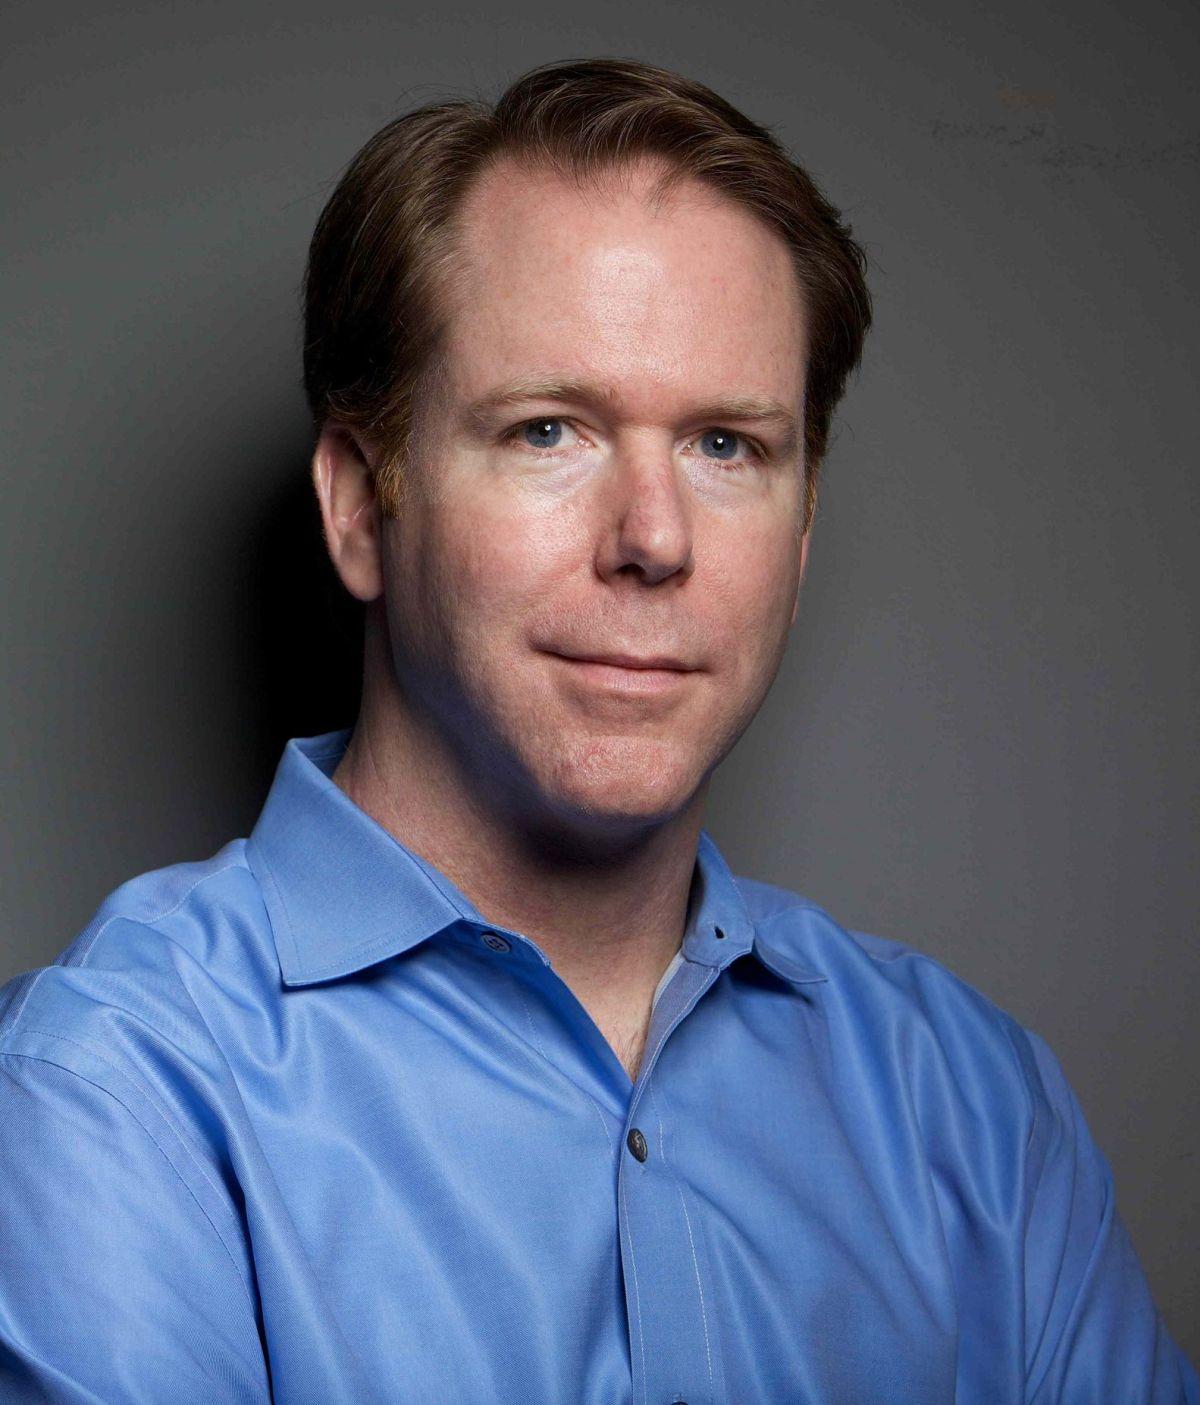 David Brindley, National Geographic, Managing Editor